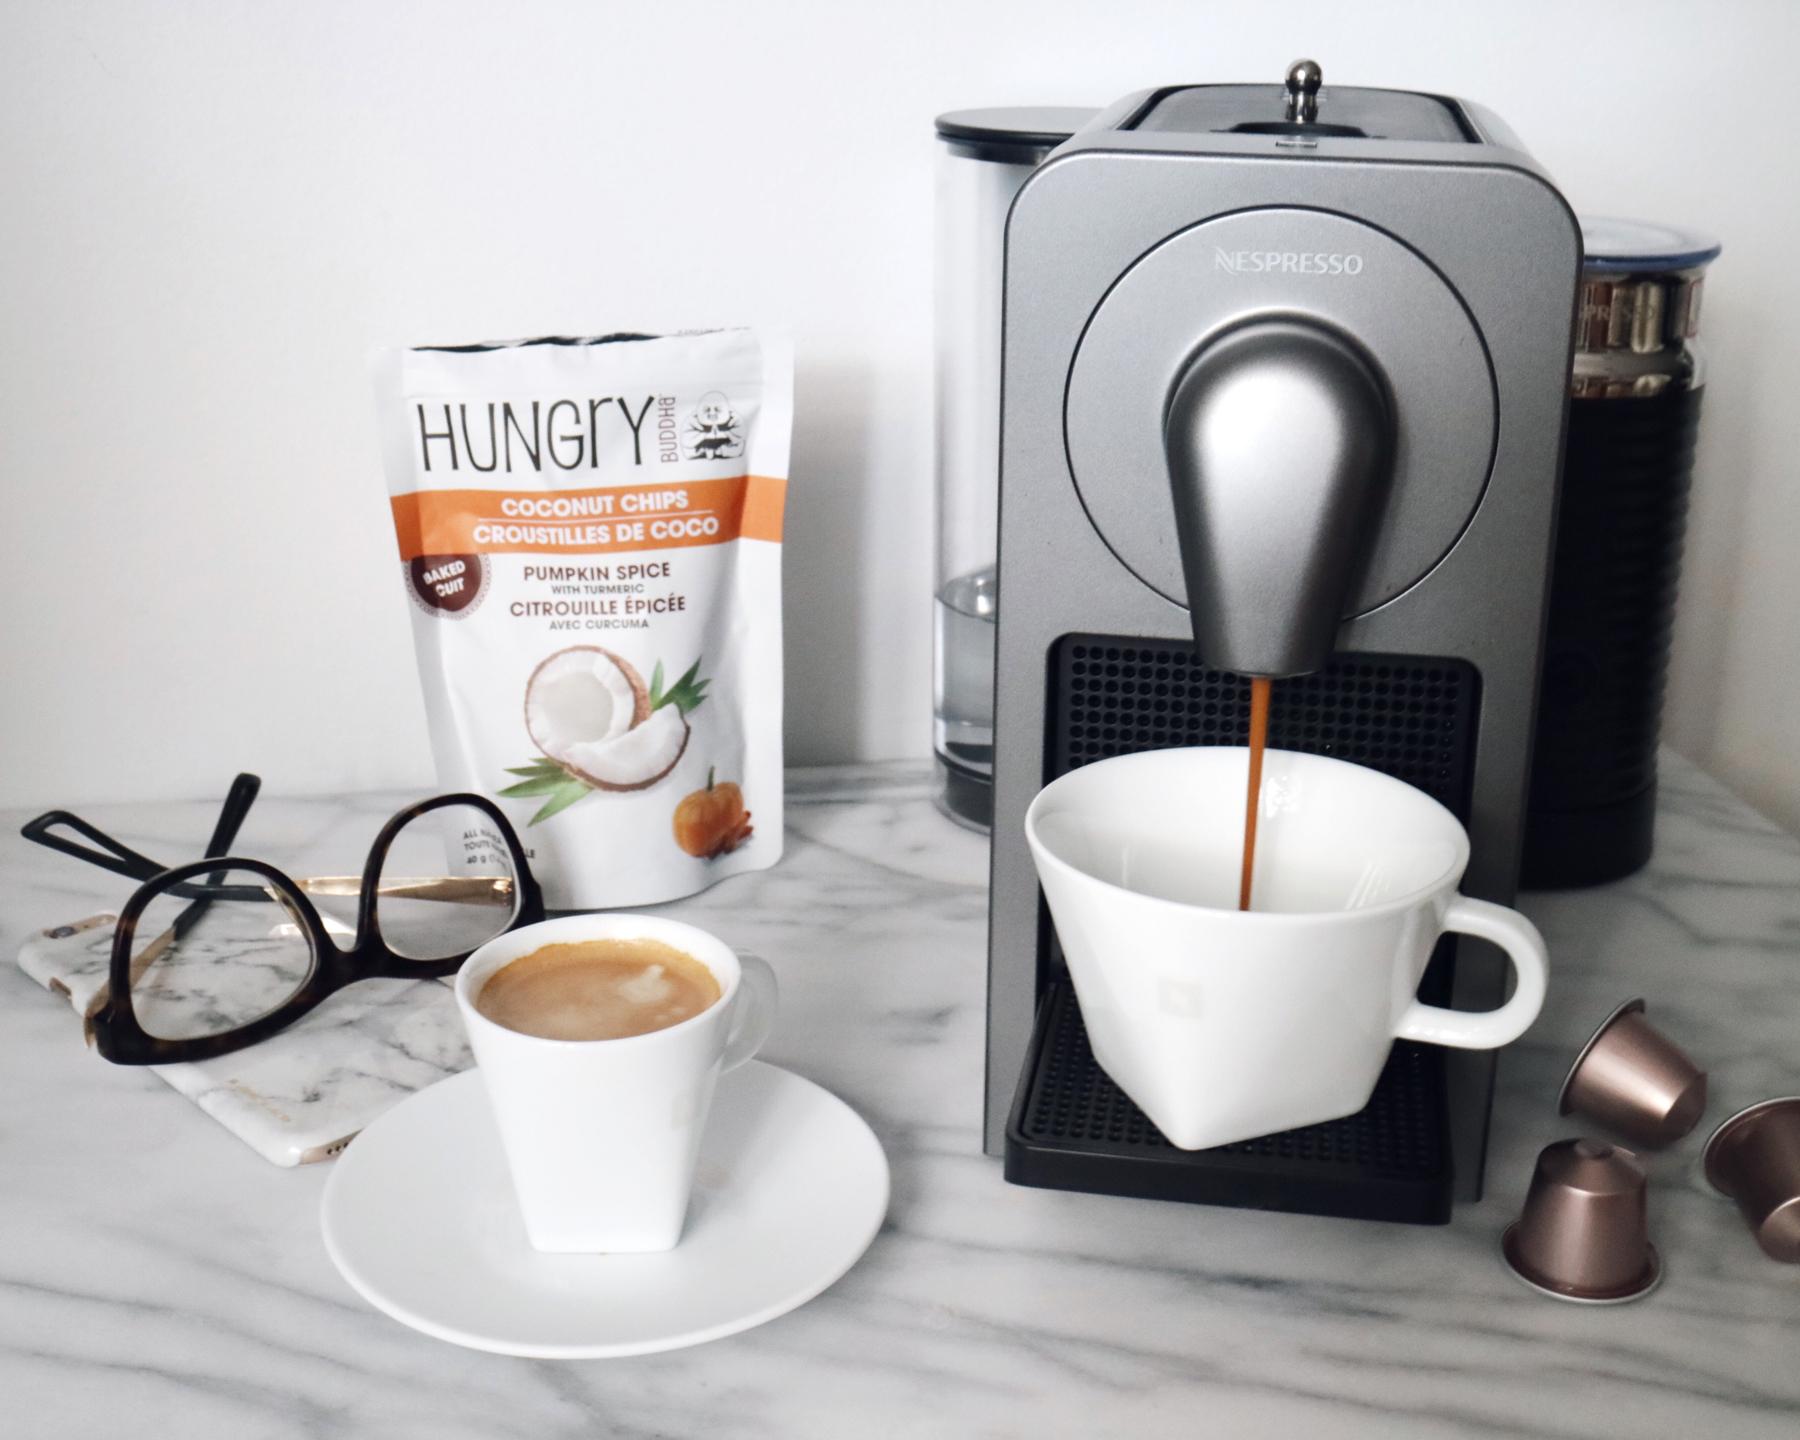 OCTOBER FAVES FEAT. MY NESPRESSO COFFEE MAKER - woahstyle.com_2605.JPG